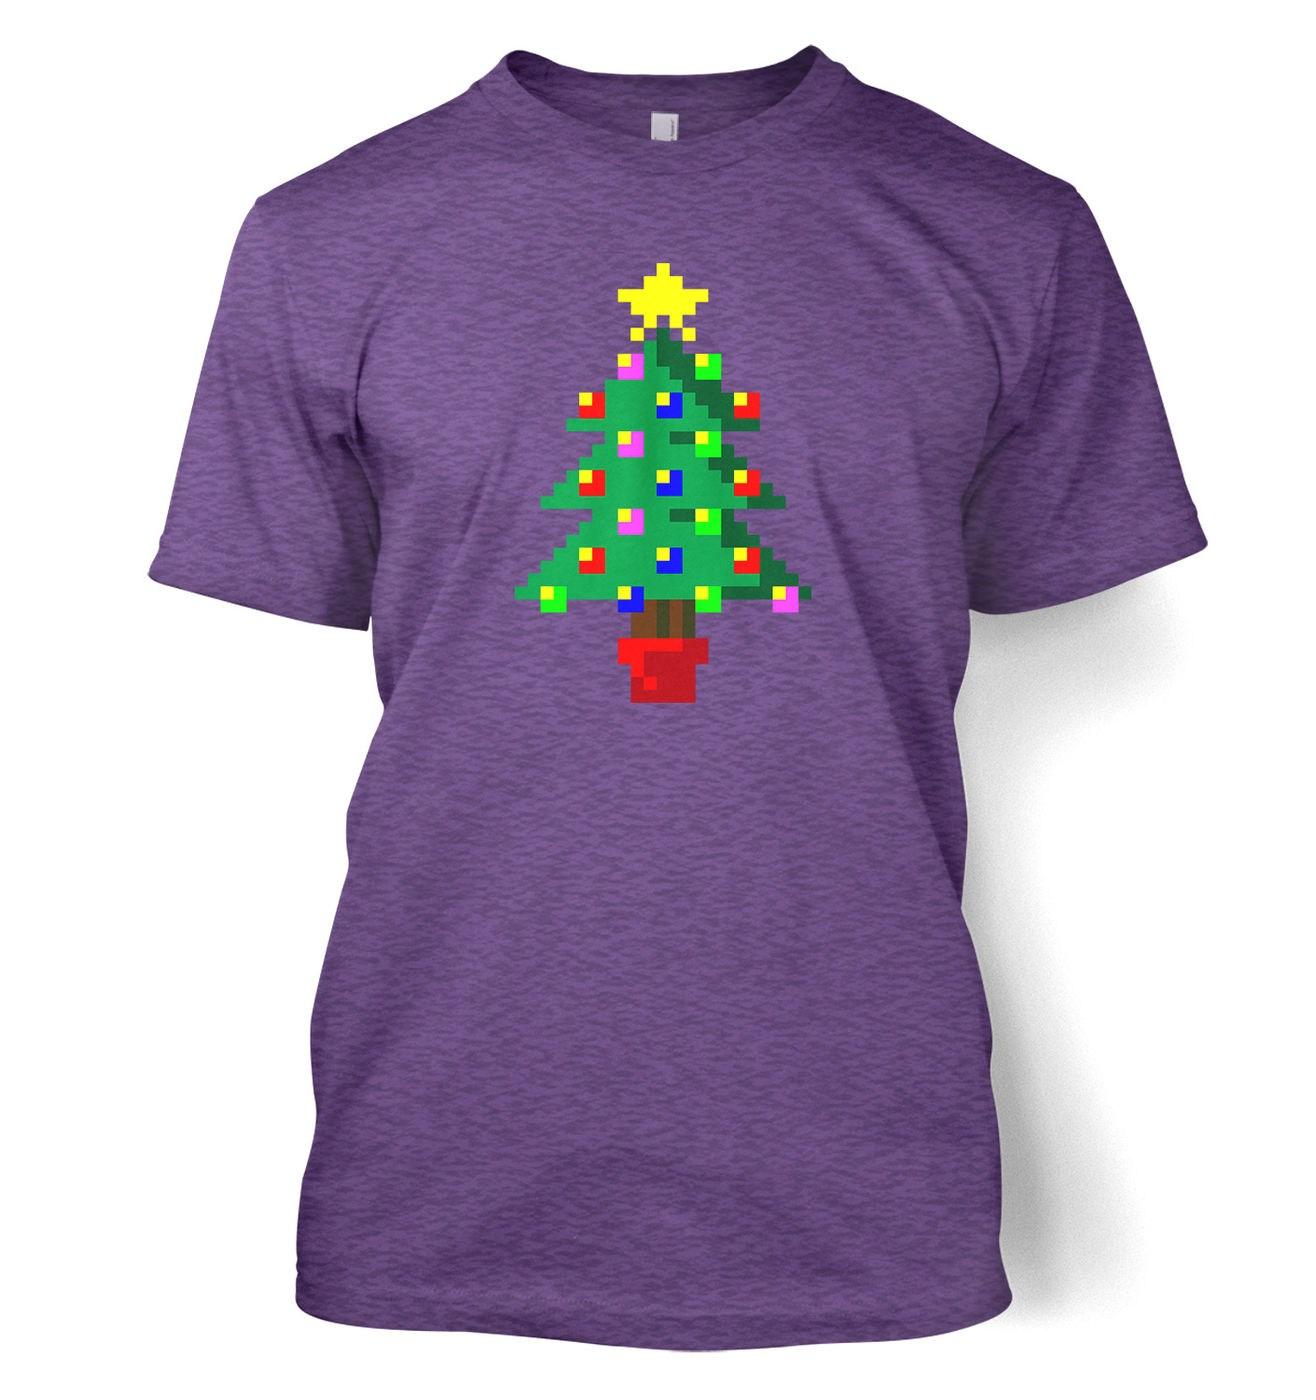 Pixellated Christmas Tree t-shirt